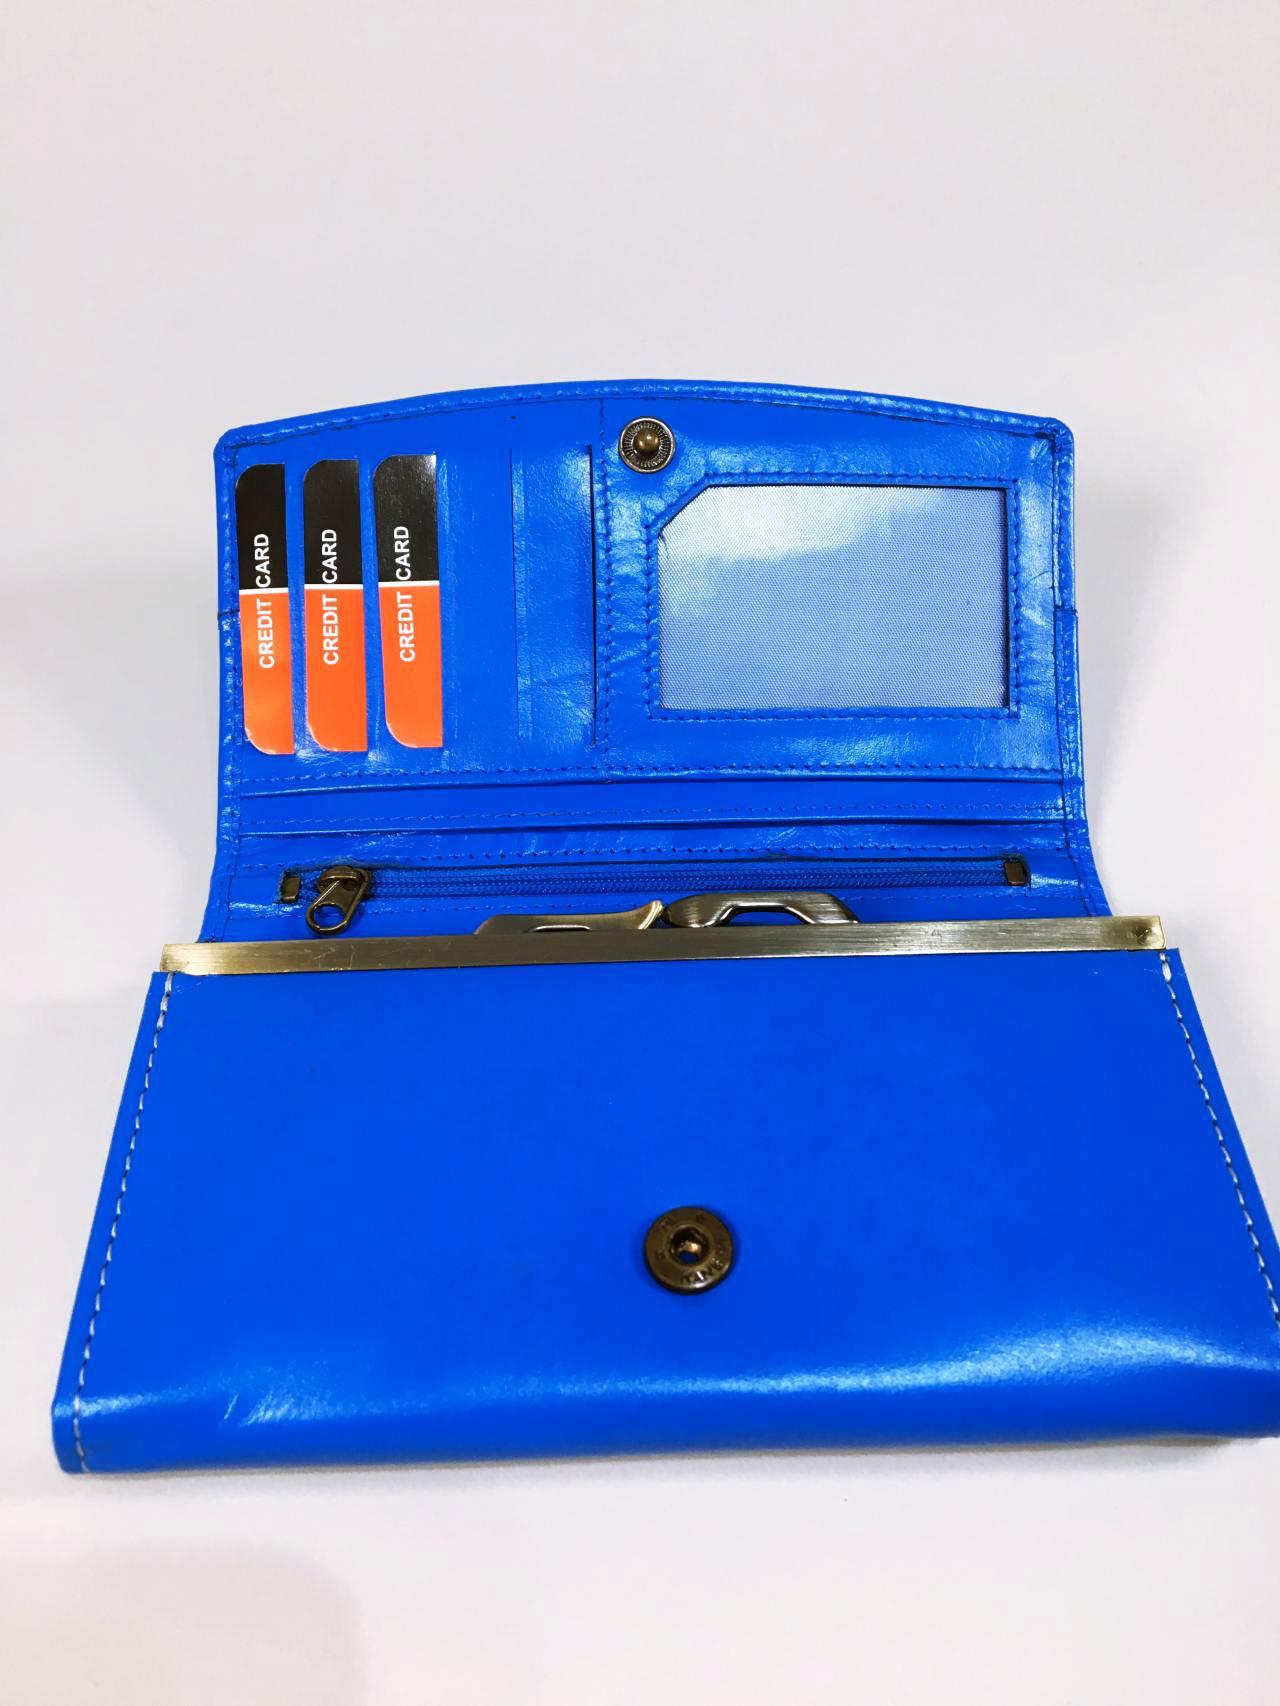 Kožená peněženka Lorenti N modrá 03